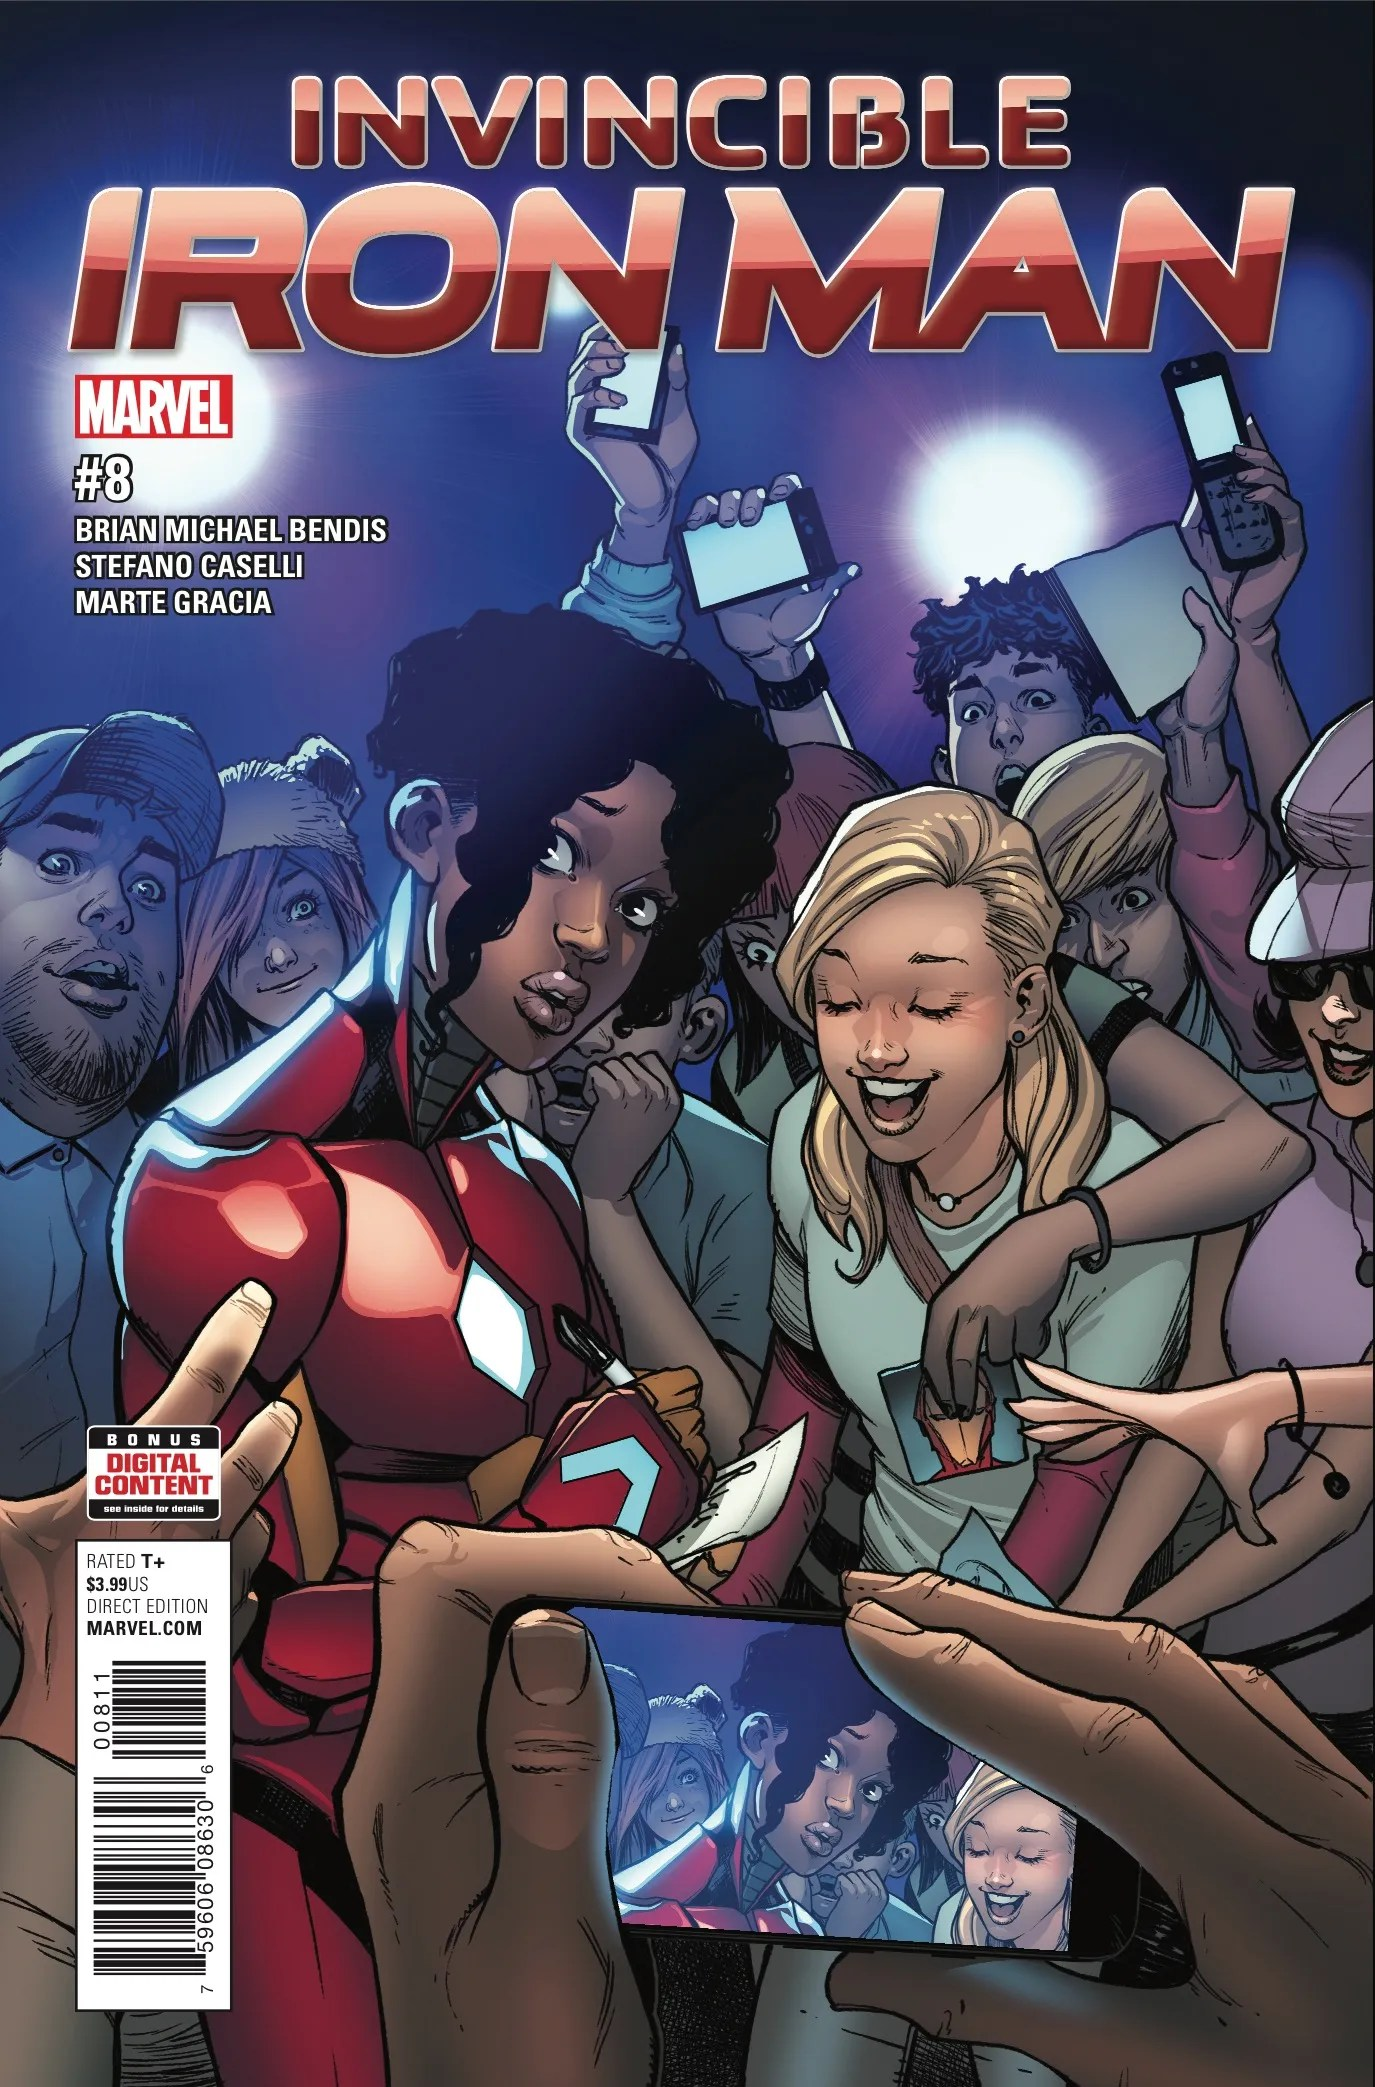 Invincible Iron Man #8 Review